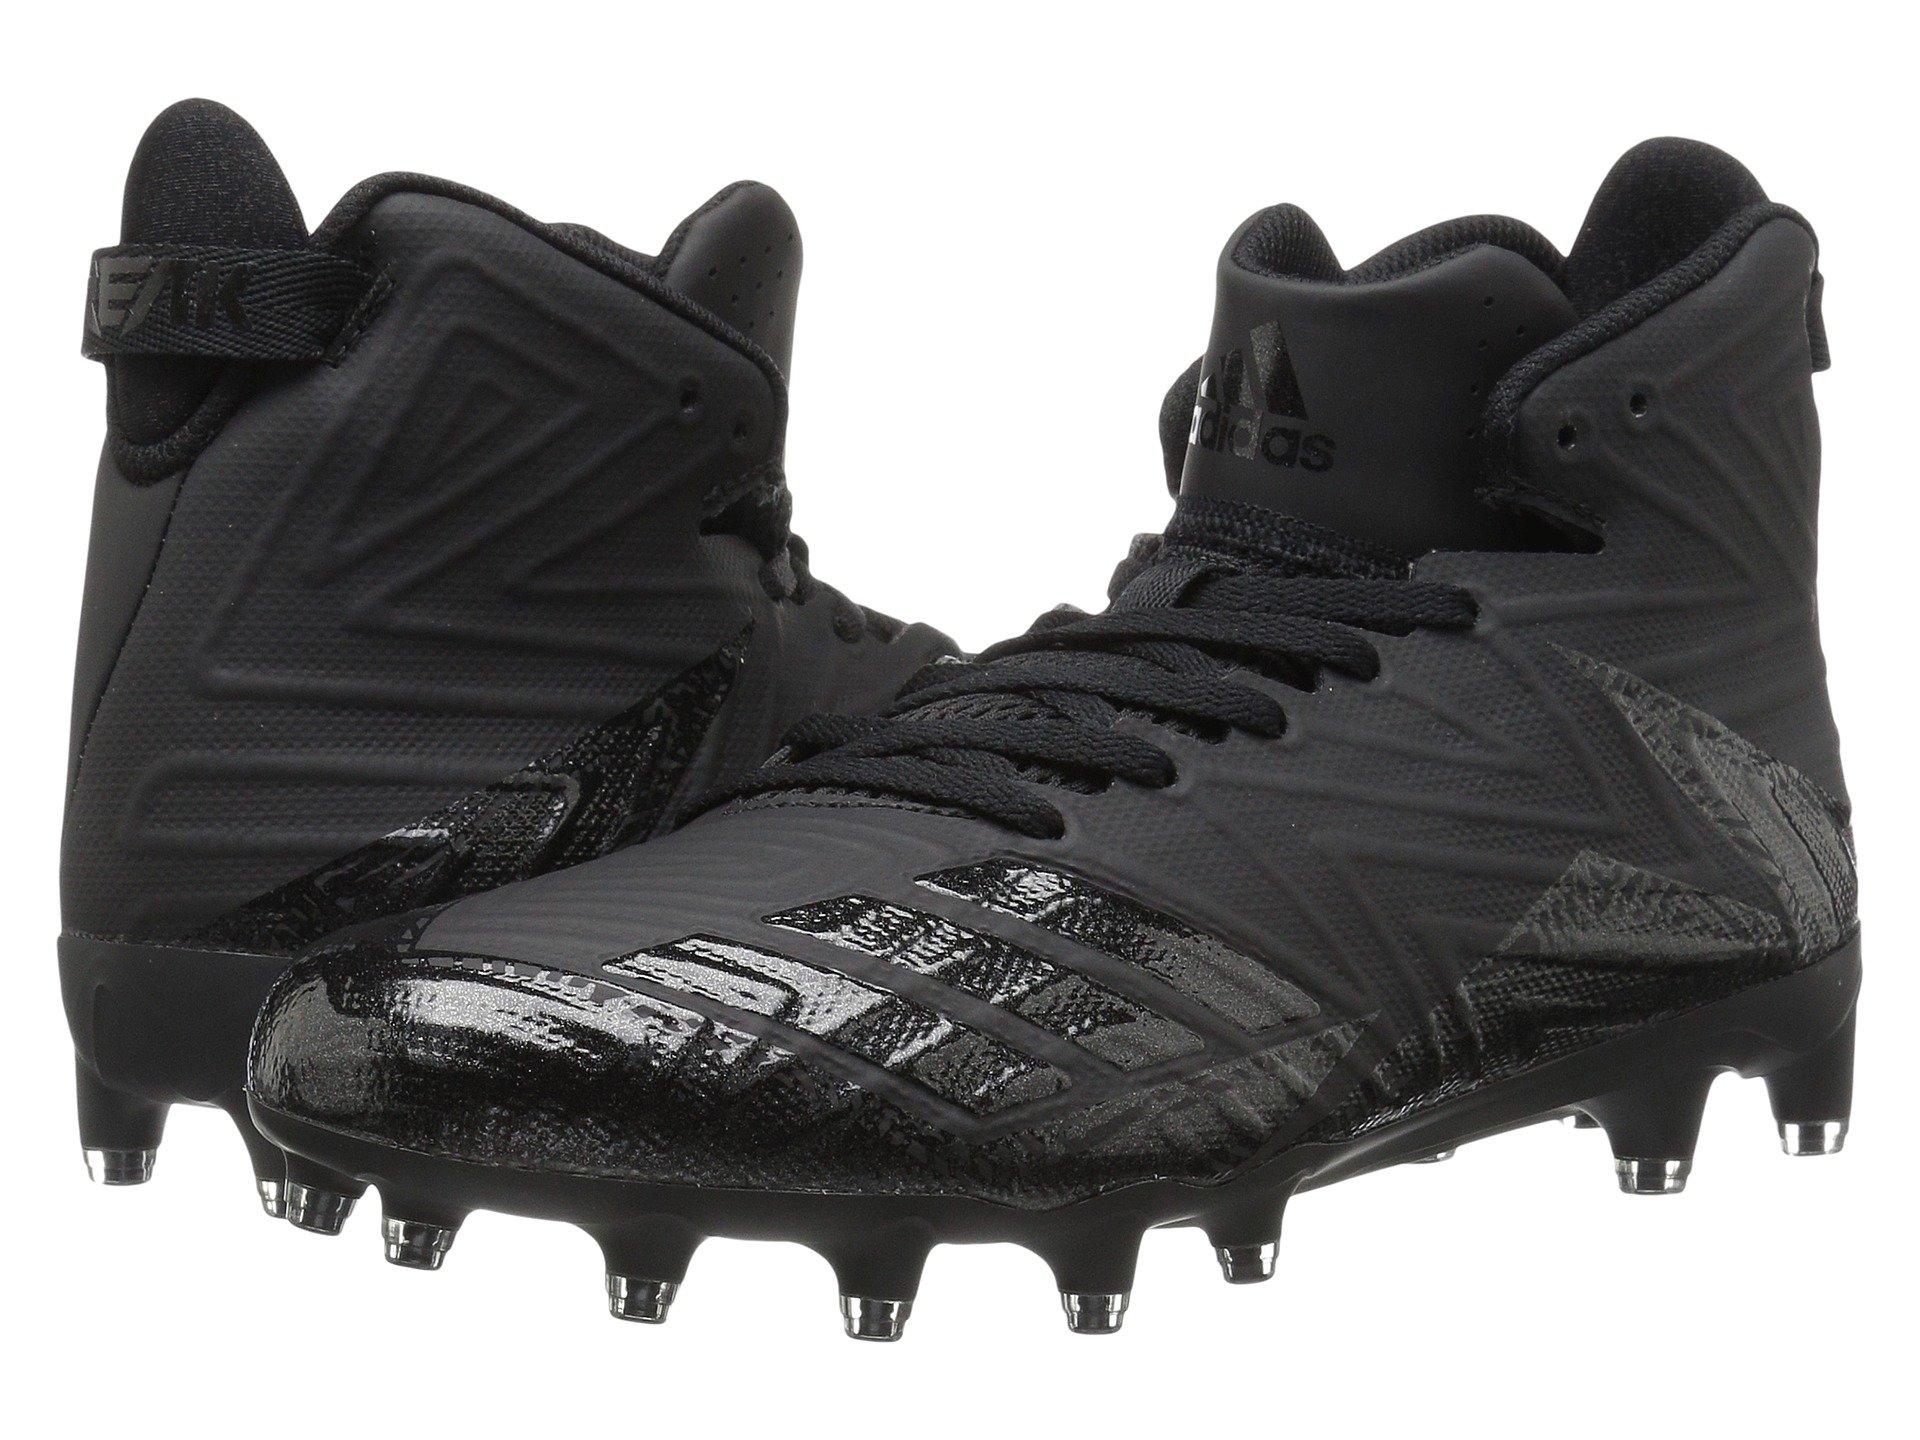 404b24b19444 Adidas Originals Freak X Carbon Mid Football In Black